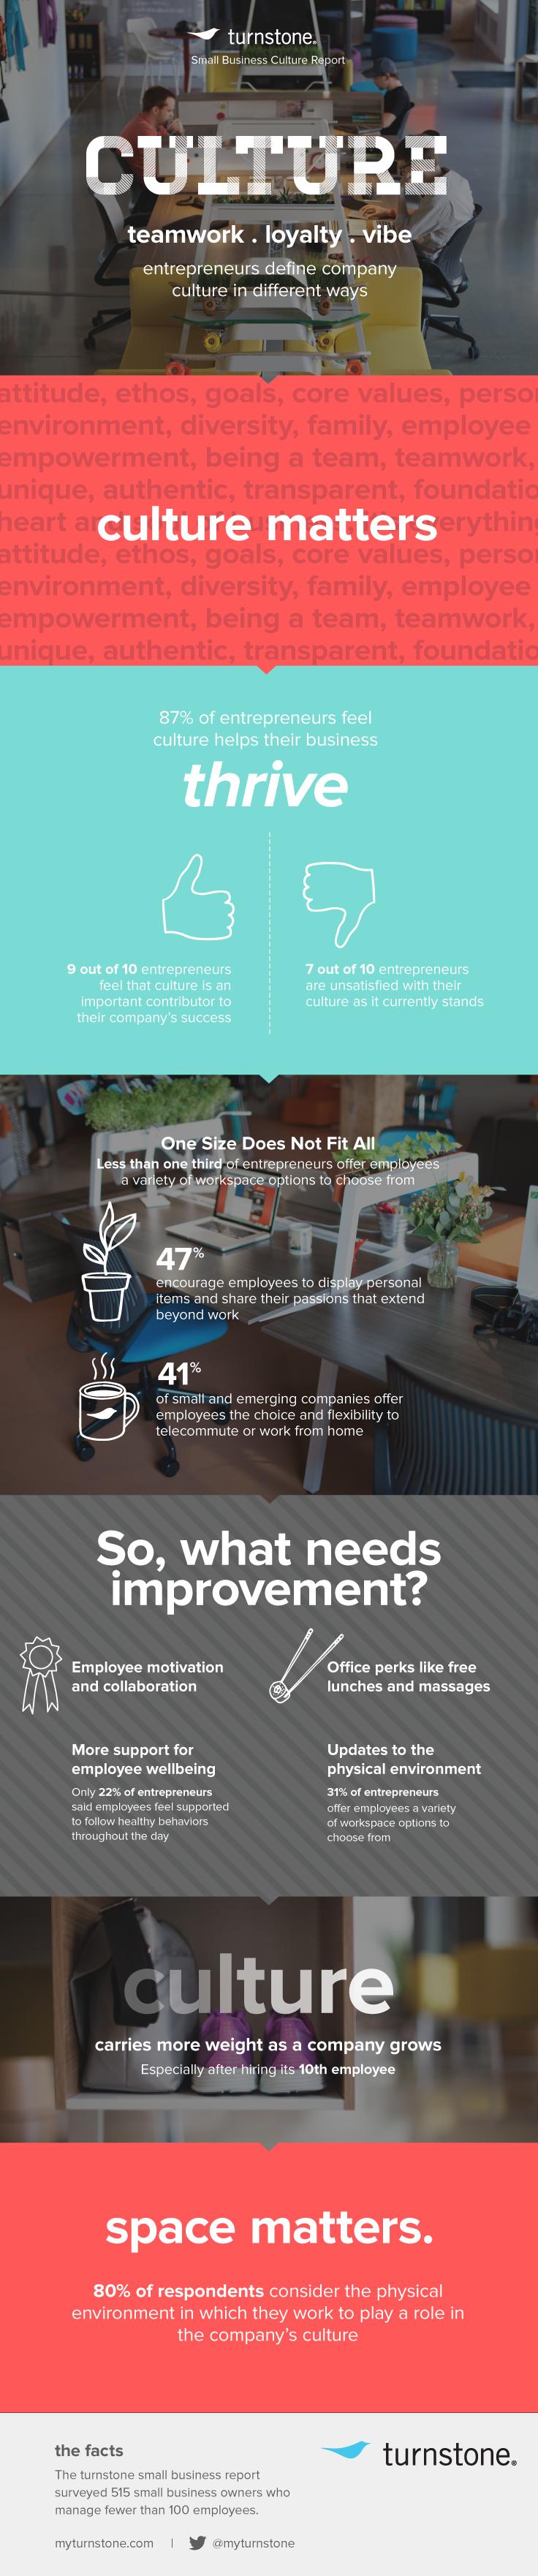 2014_ts_social_736w_infographic_culture_v1